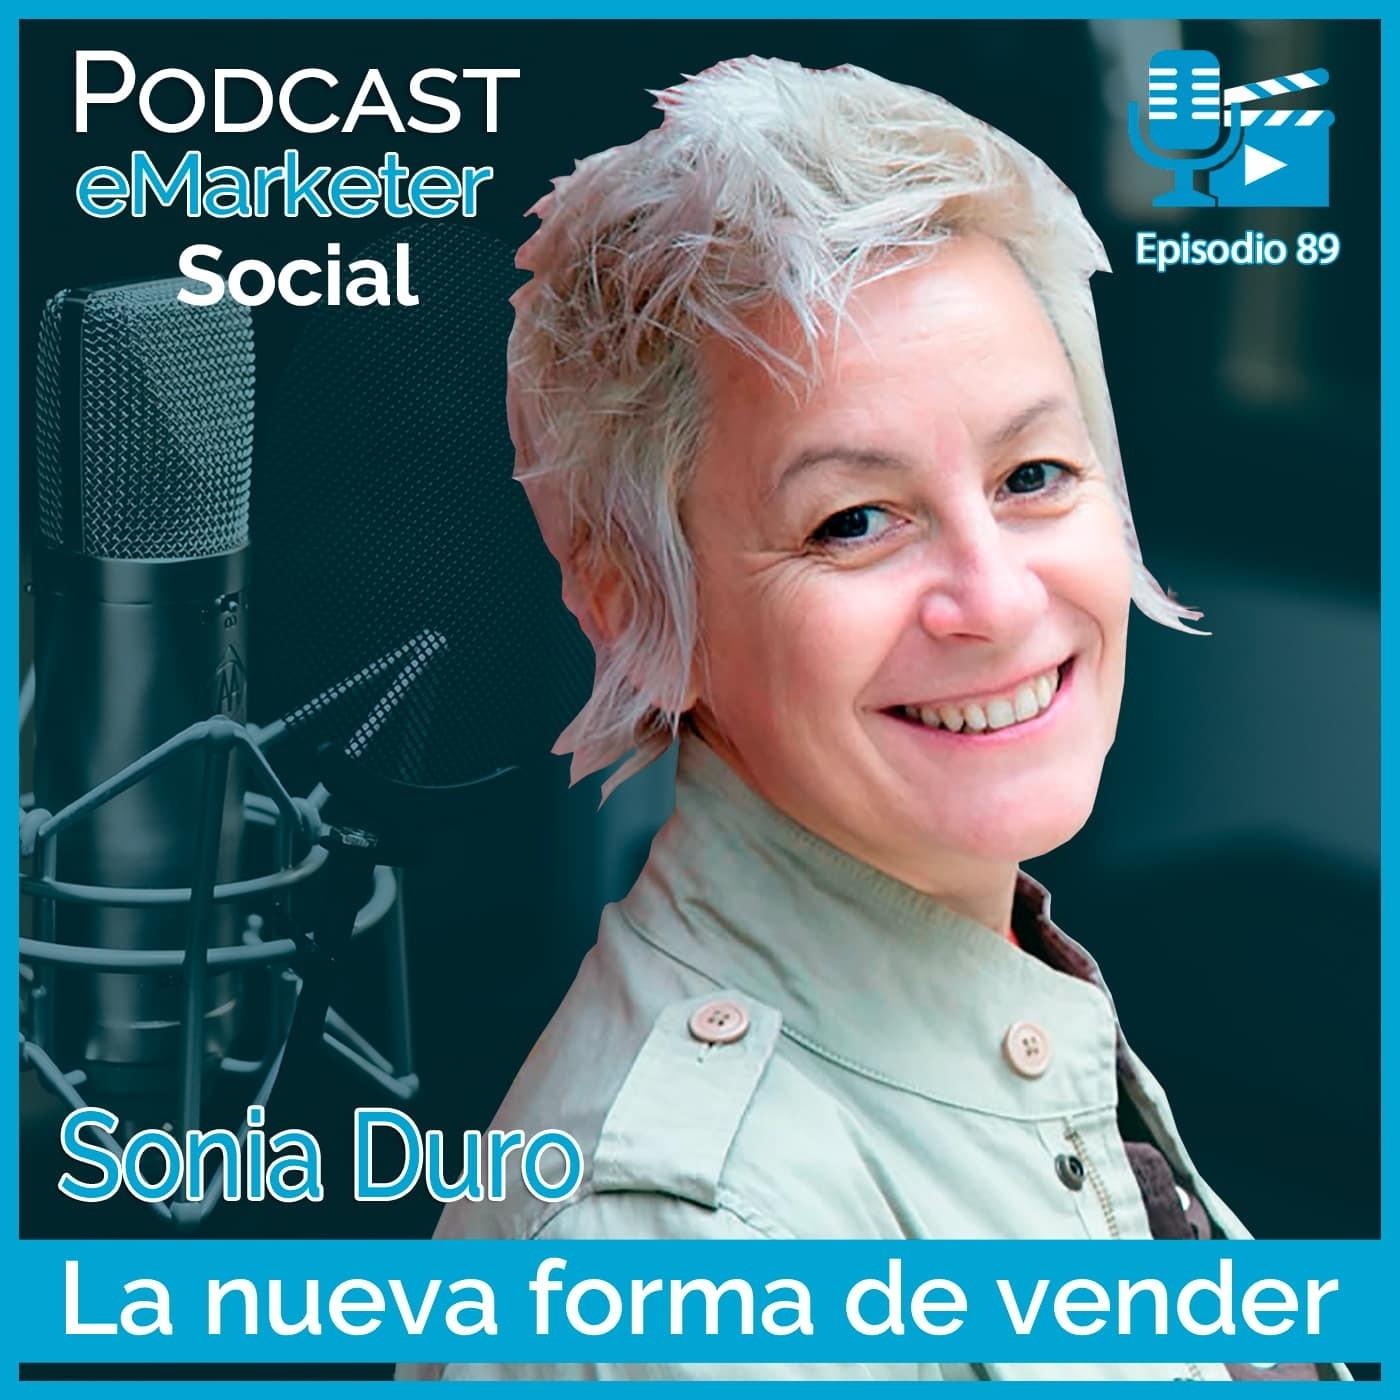 089 Sonia Duro Limia, su historia (1ªparte) en Podcast eMarketerSocial